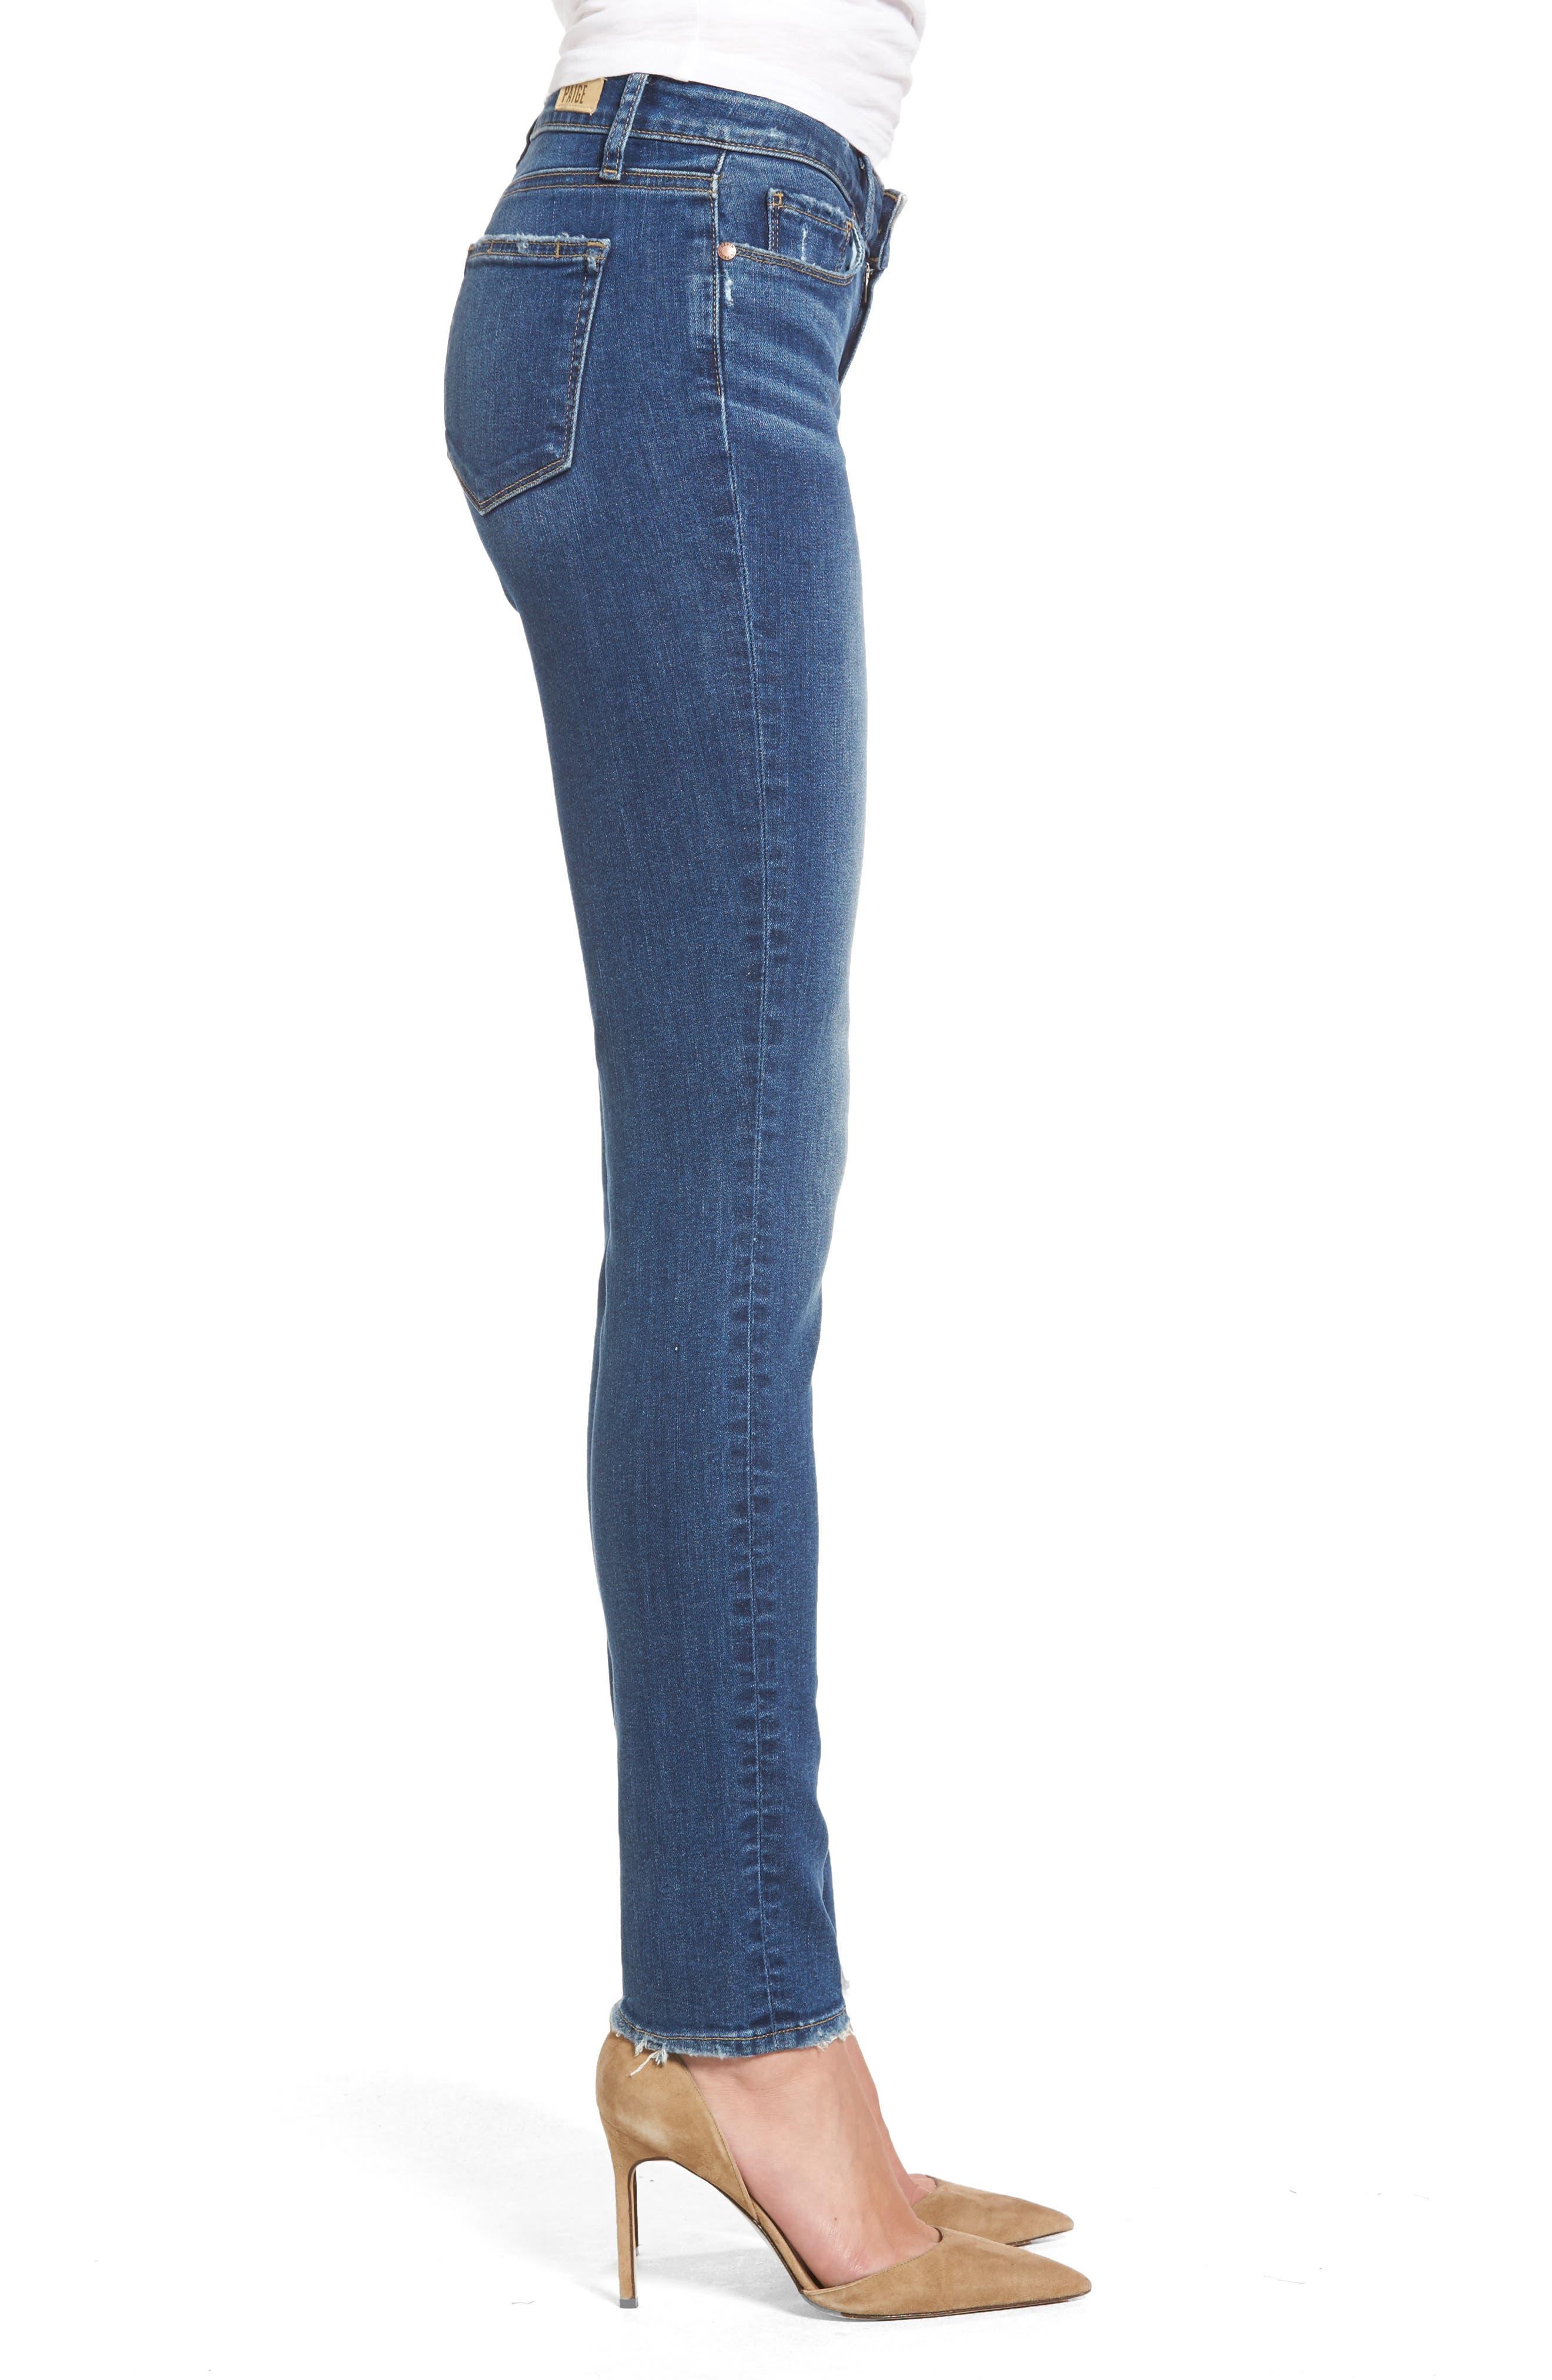 Skyline Skinny Jeans,                             Alternate thumbnail 4, color,                             400